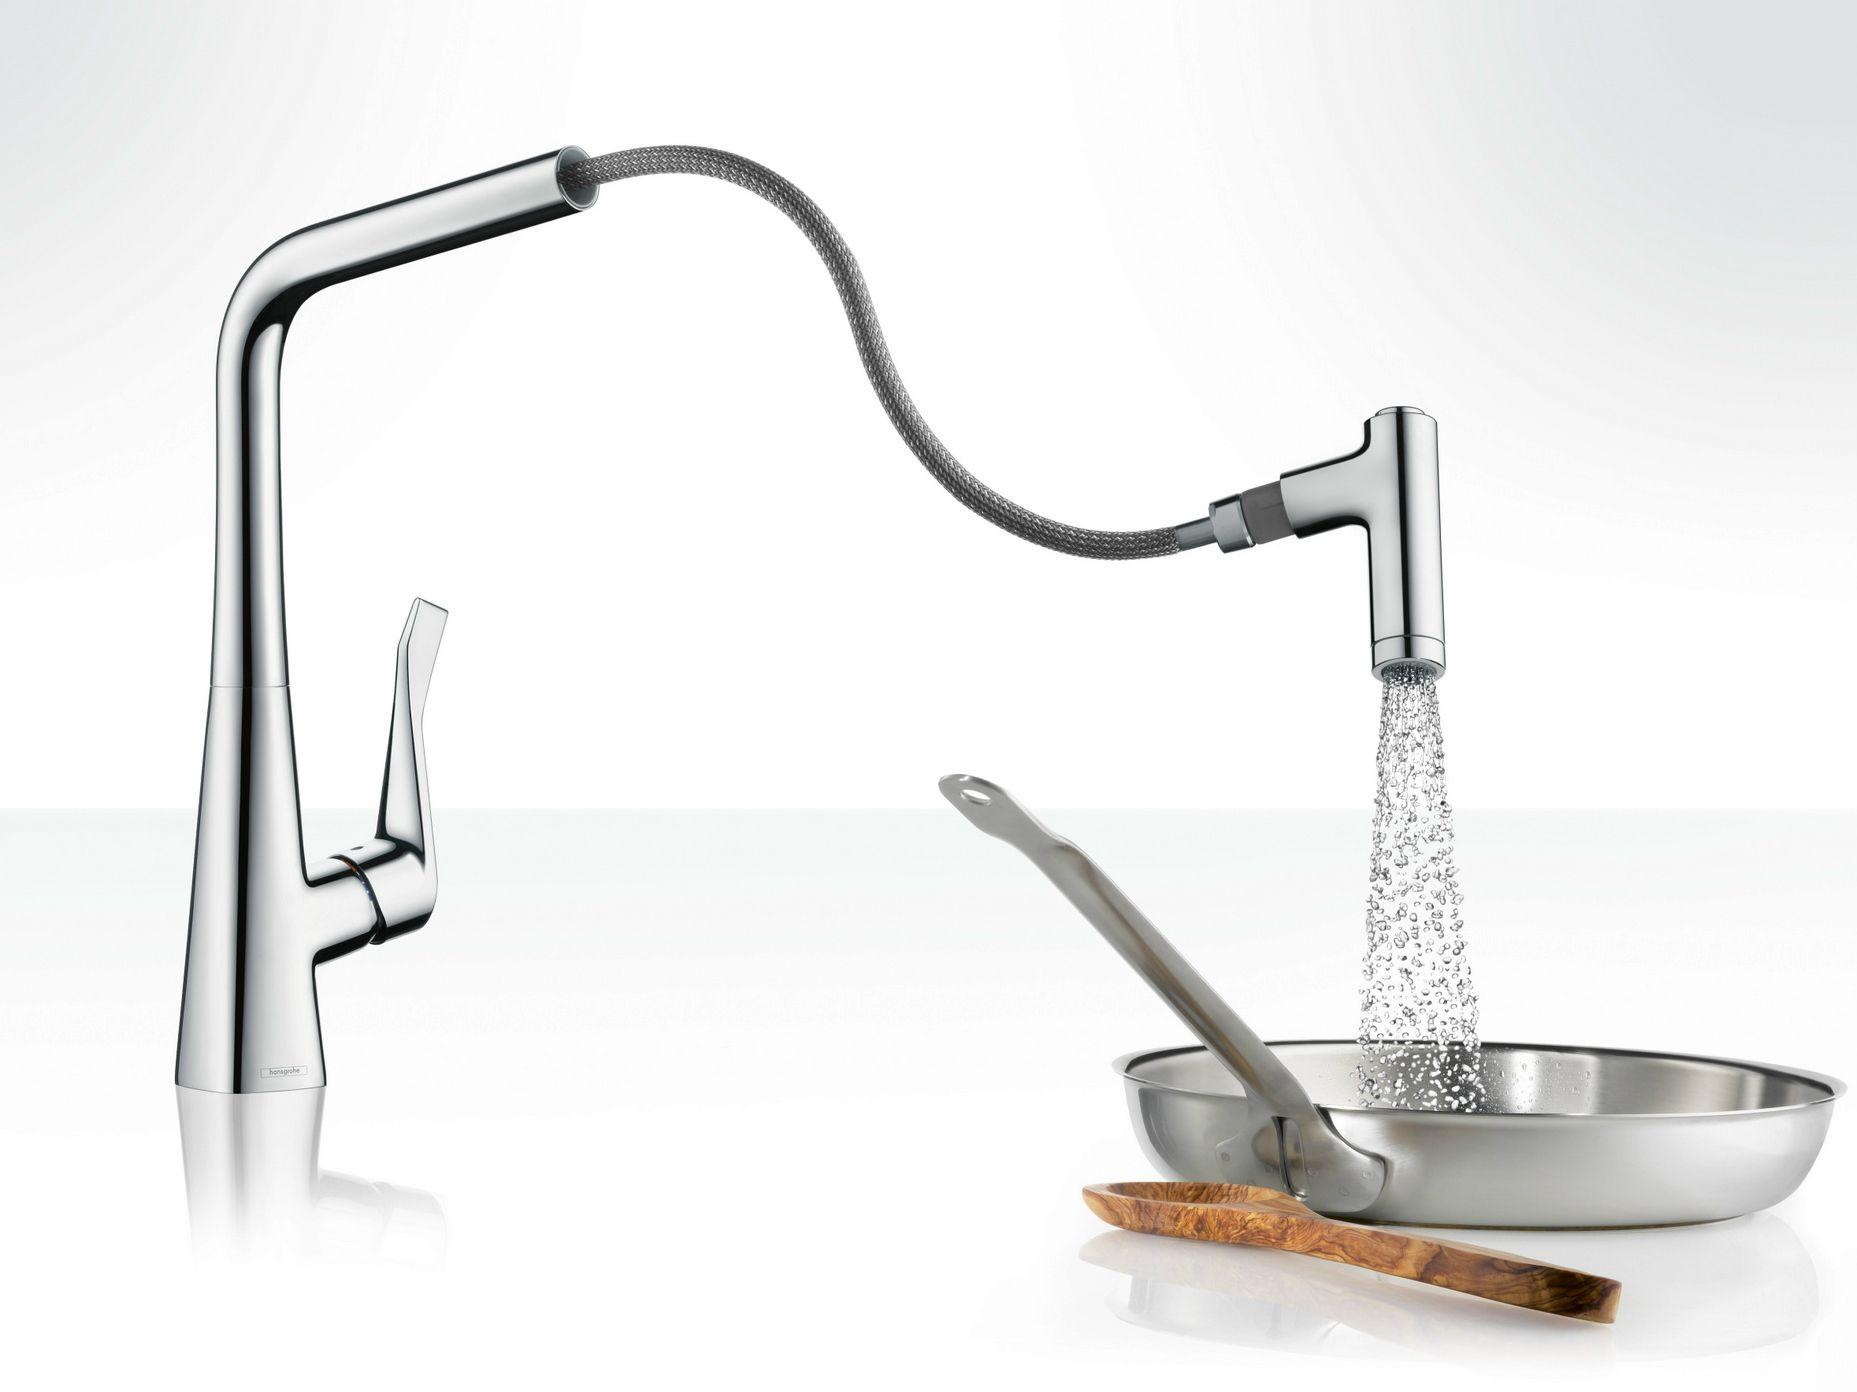 Metris robinet de cuisine chrome by hansgrohe design - Robinet hansgrohe cuisine ...